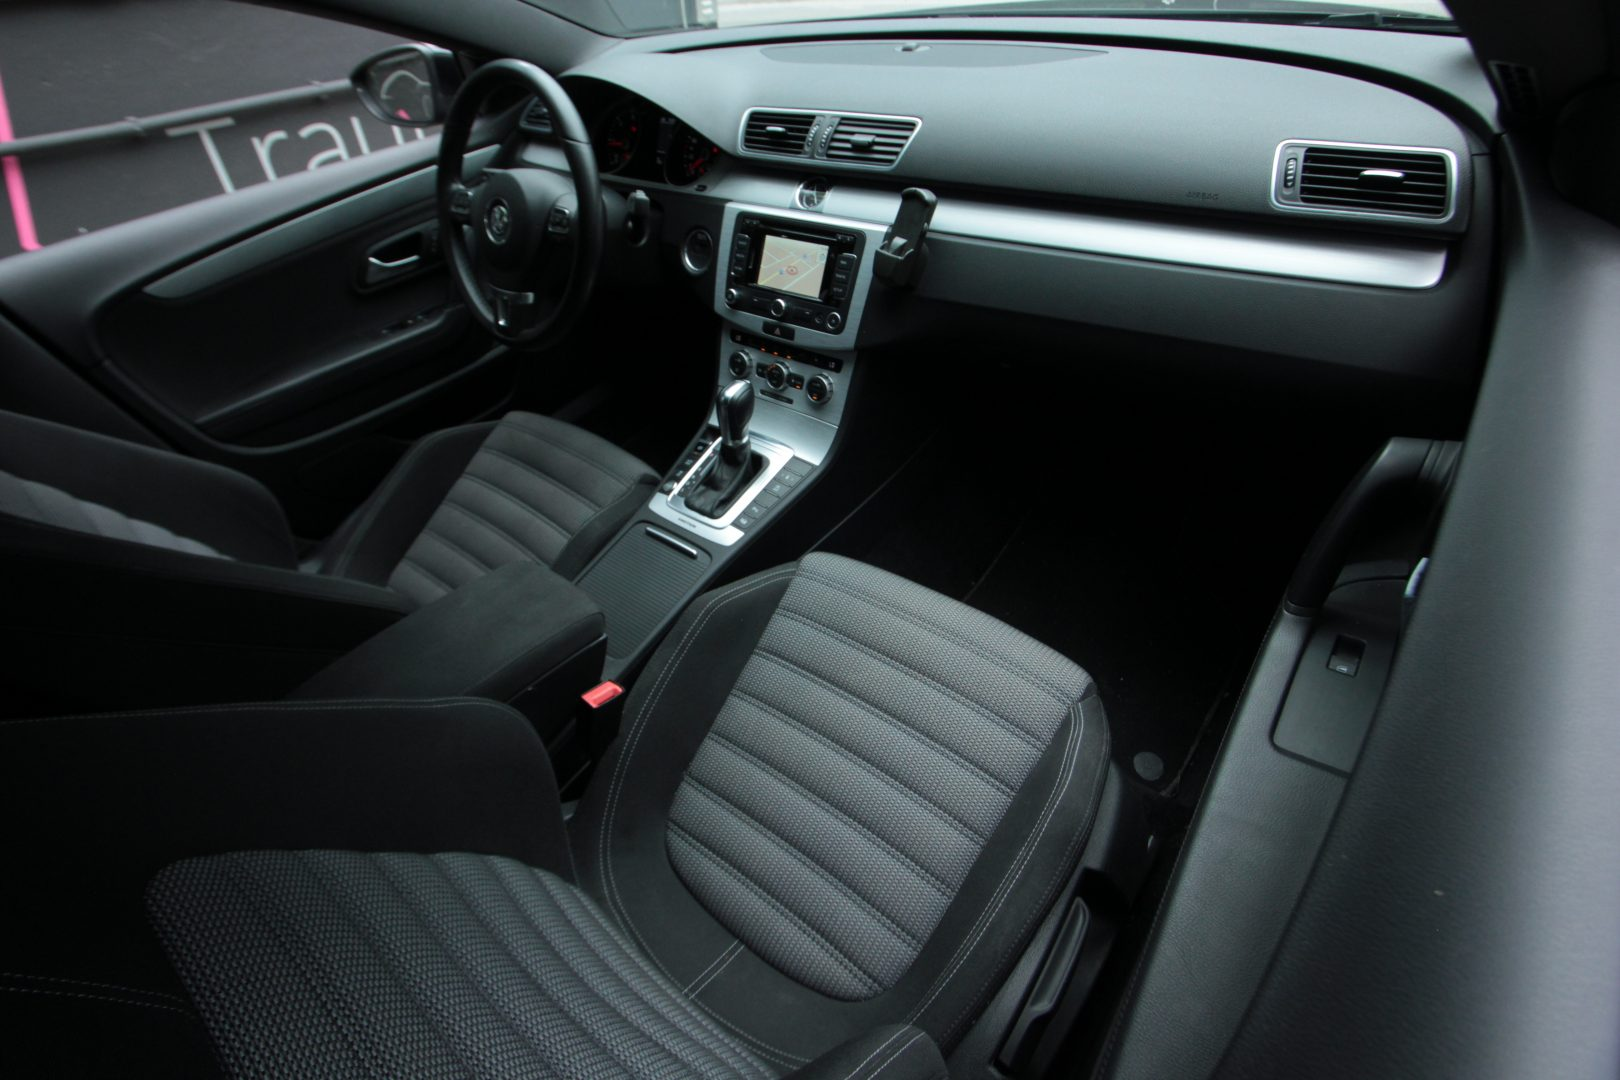 AIL VW CC 2.0TDI Basis BMT 4Motion DSG 9